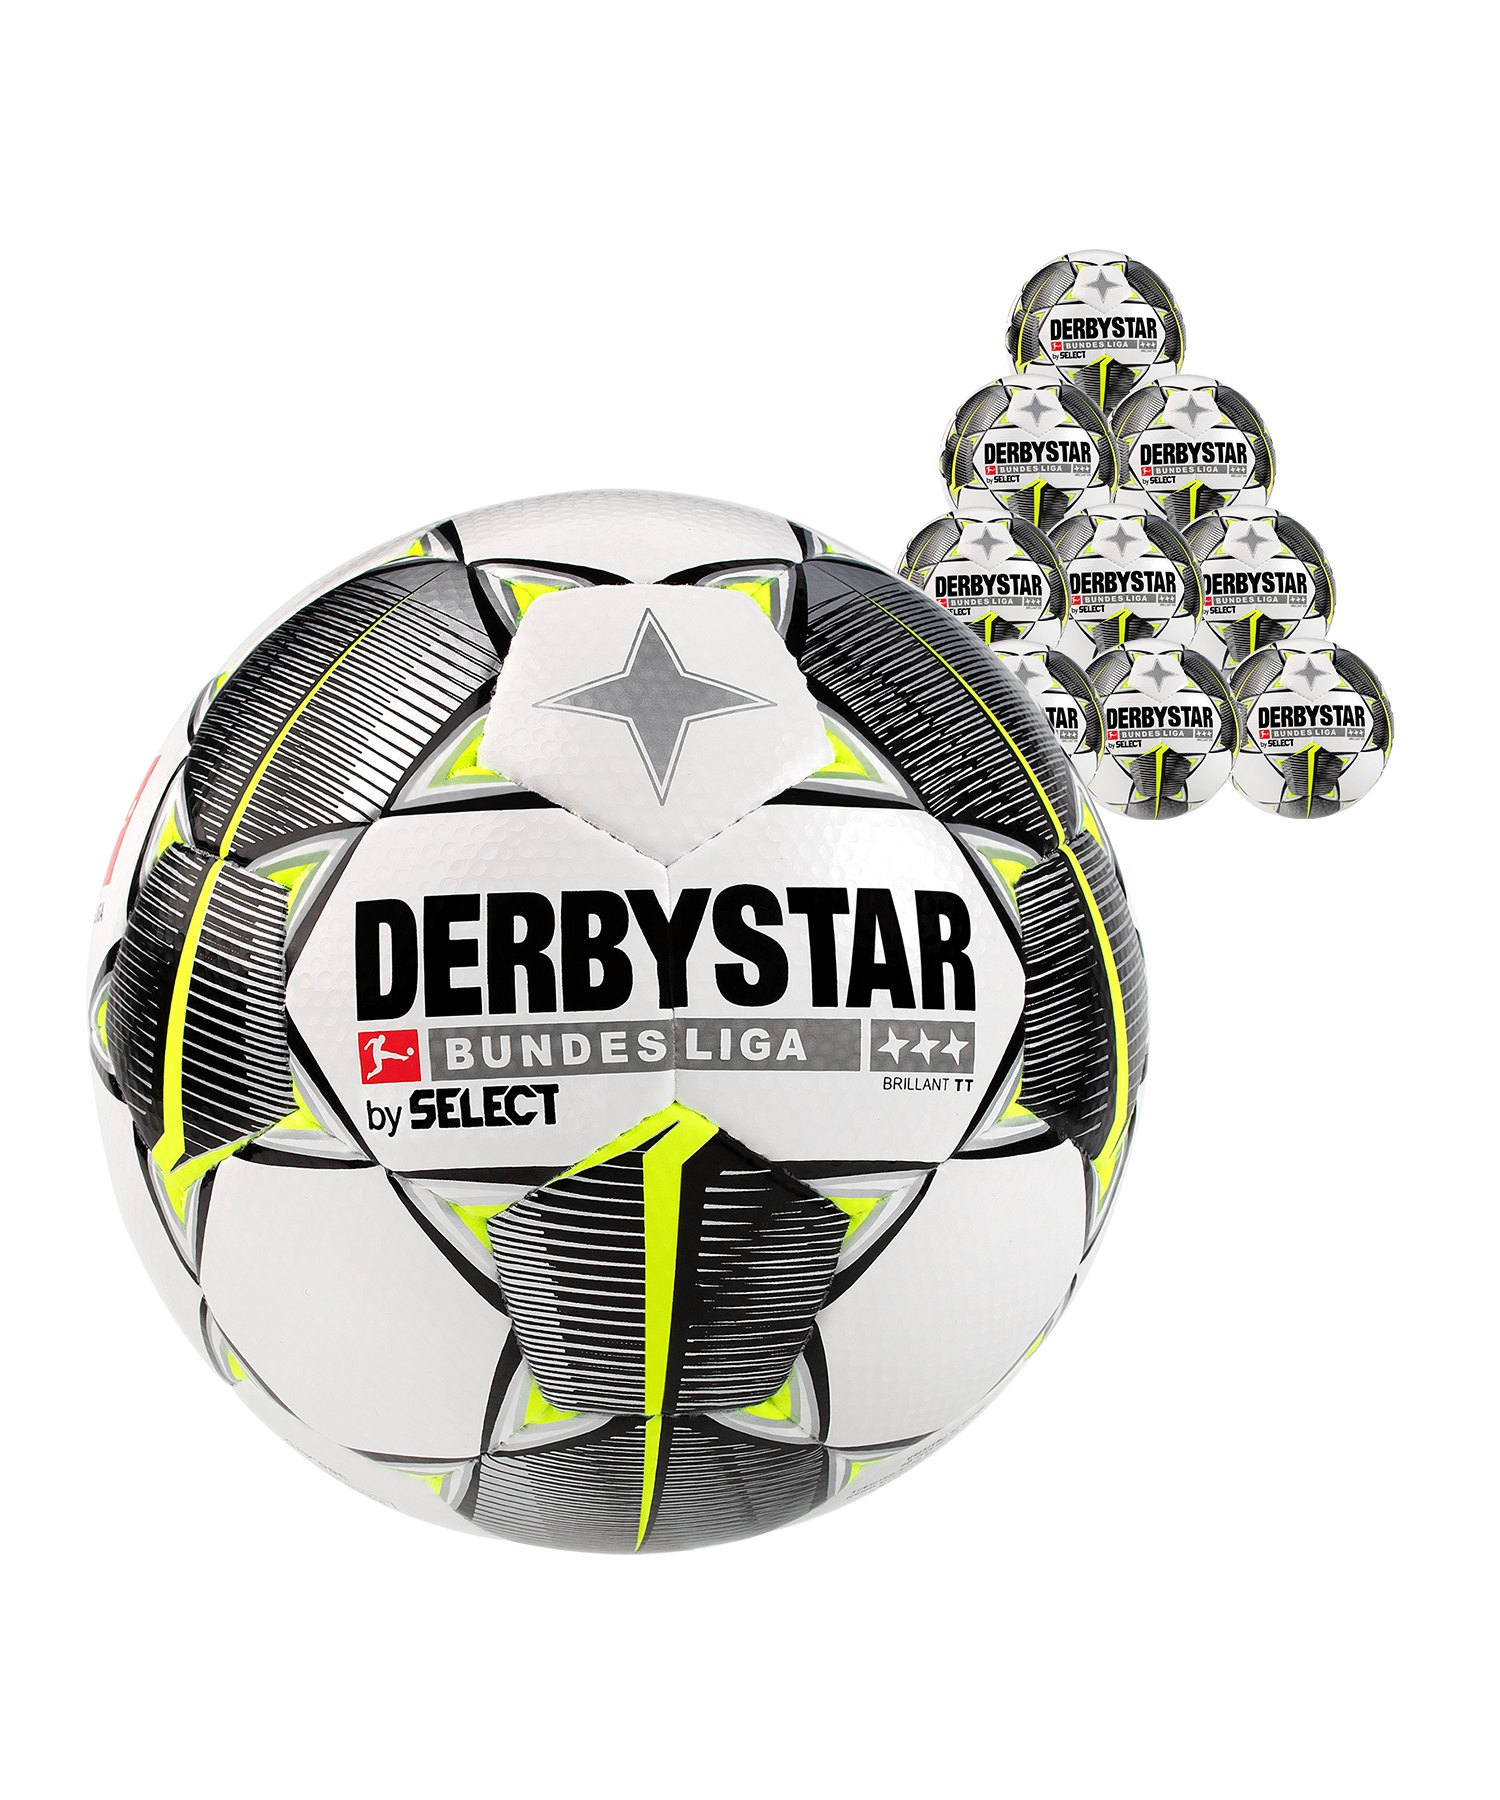 Derbystar Buli Bril TT HS Trainingsball 50x Gr.5 Weiss F19 - weiss